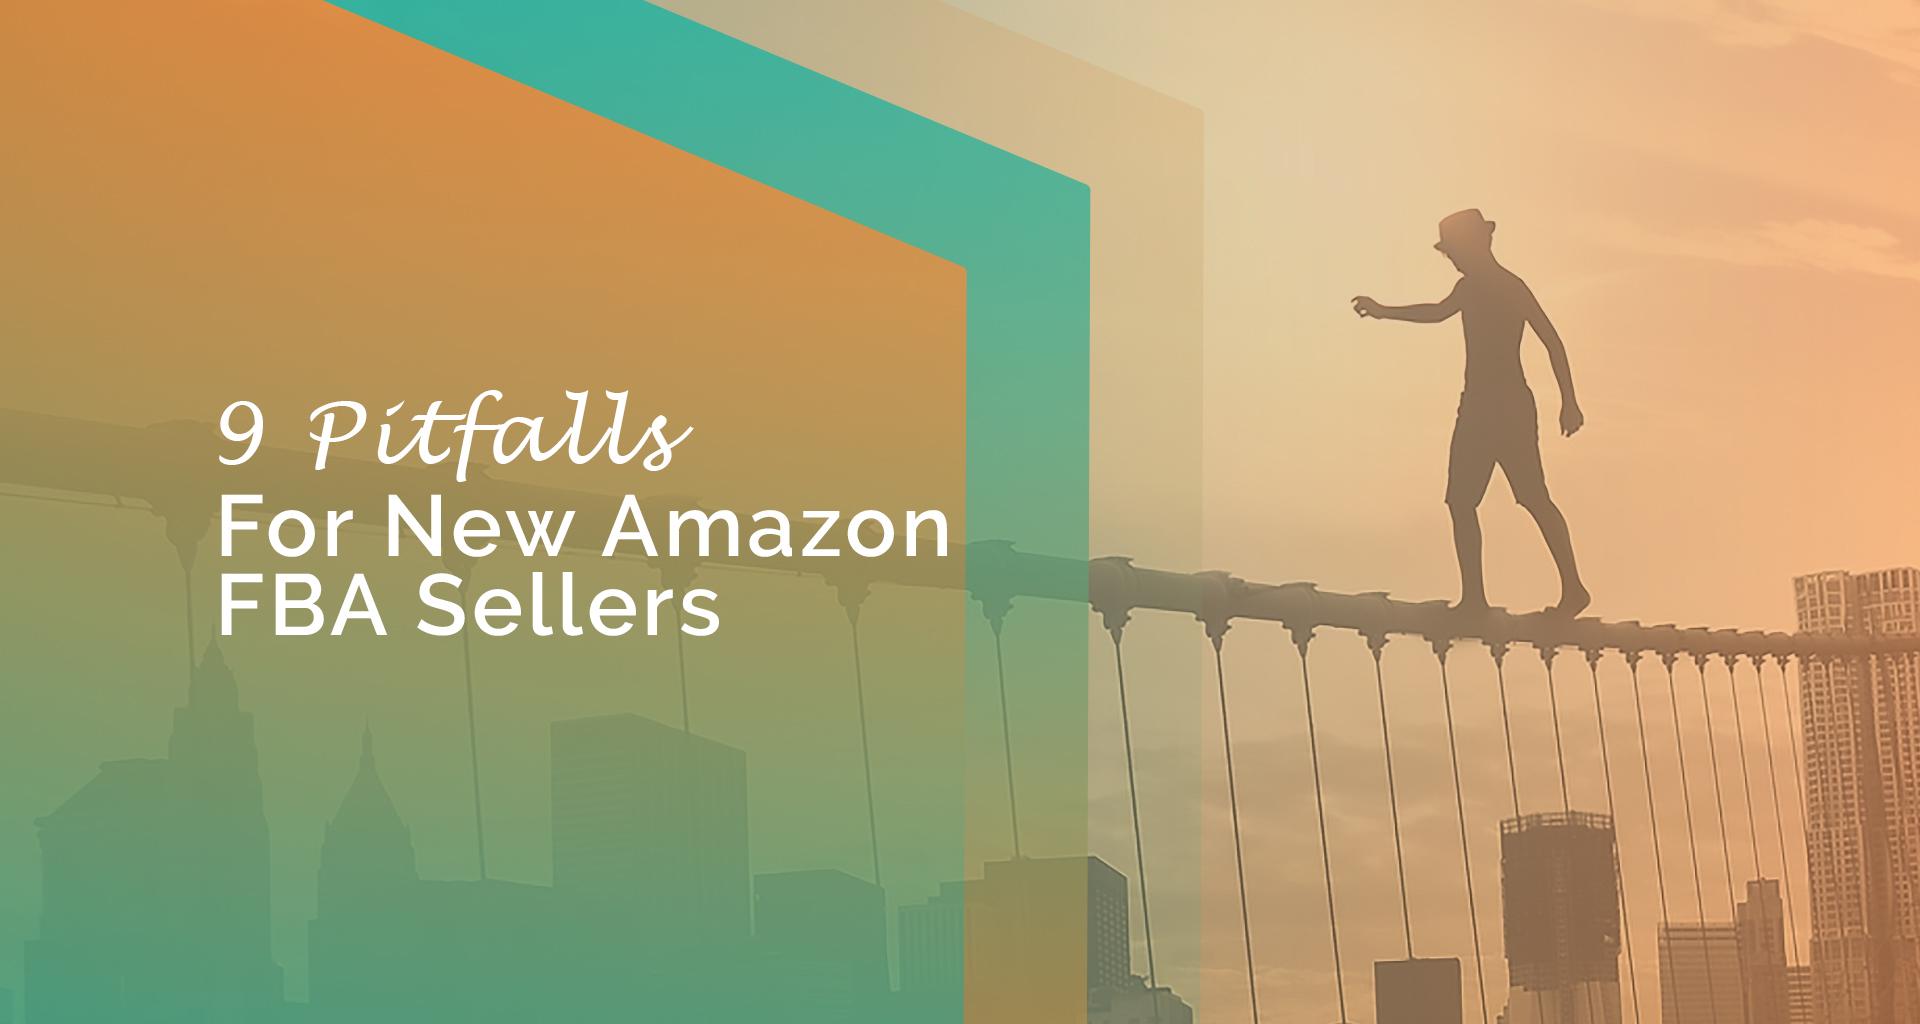 9 Pitfalls for New Amazon FBA Sellers